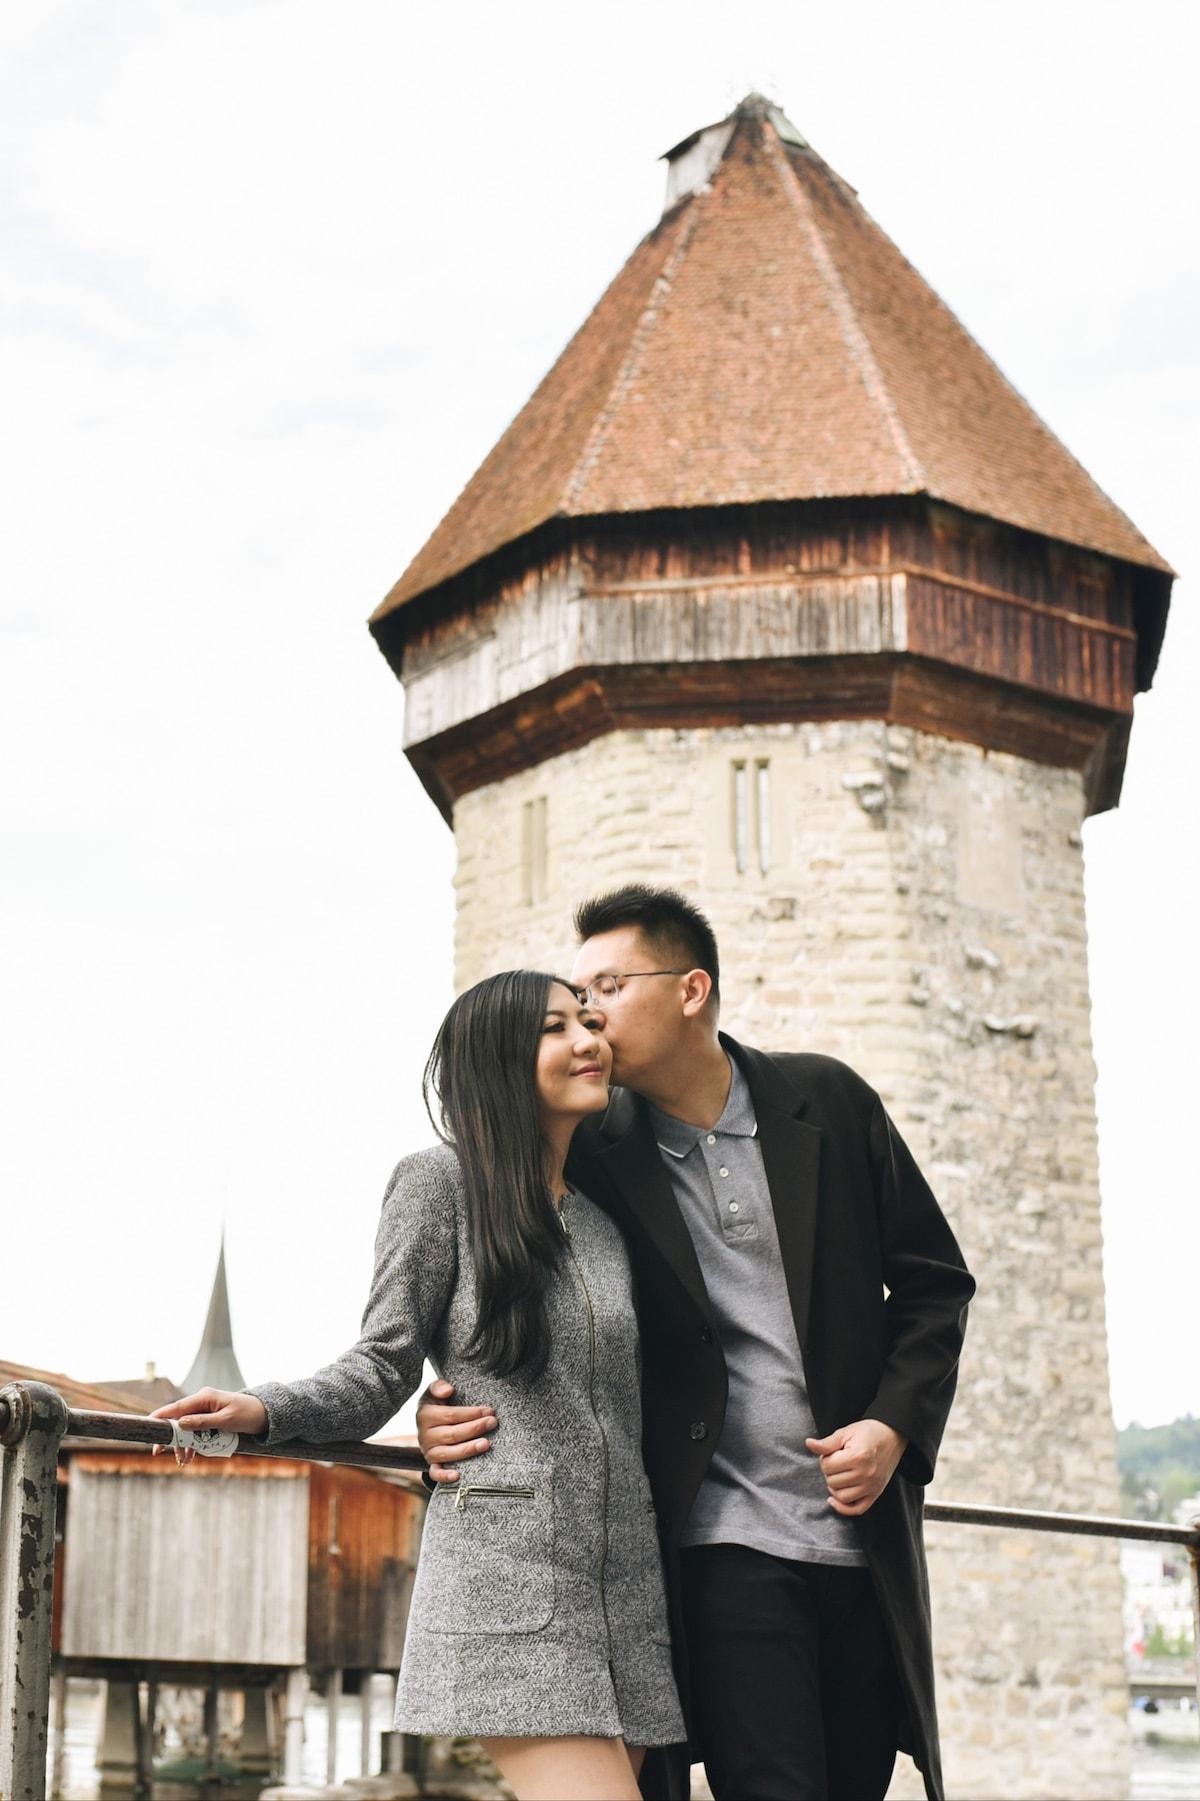 Madeleine Luzern Speed Dating randki samotne